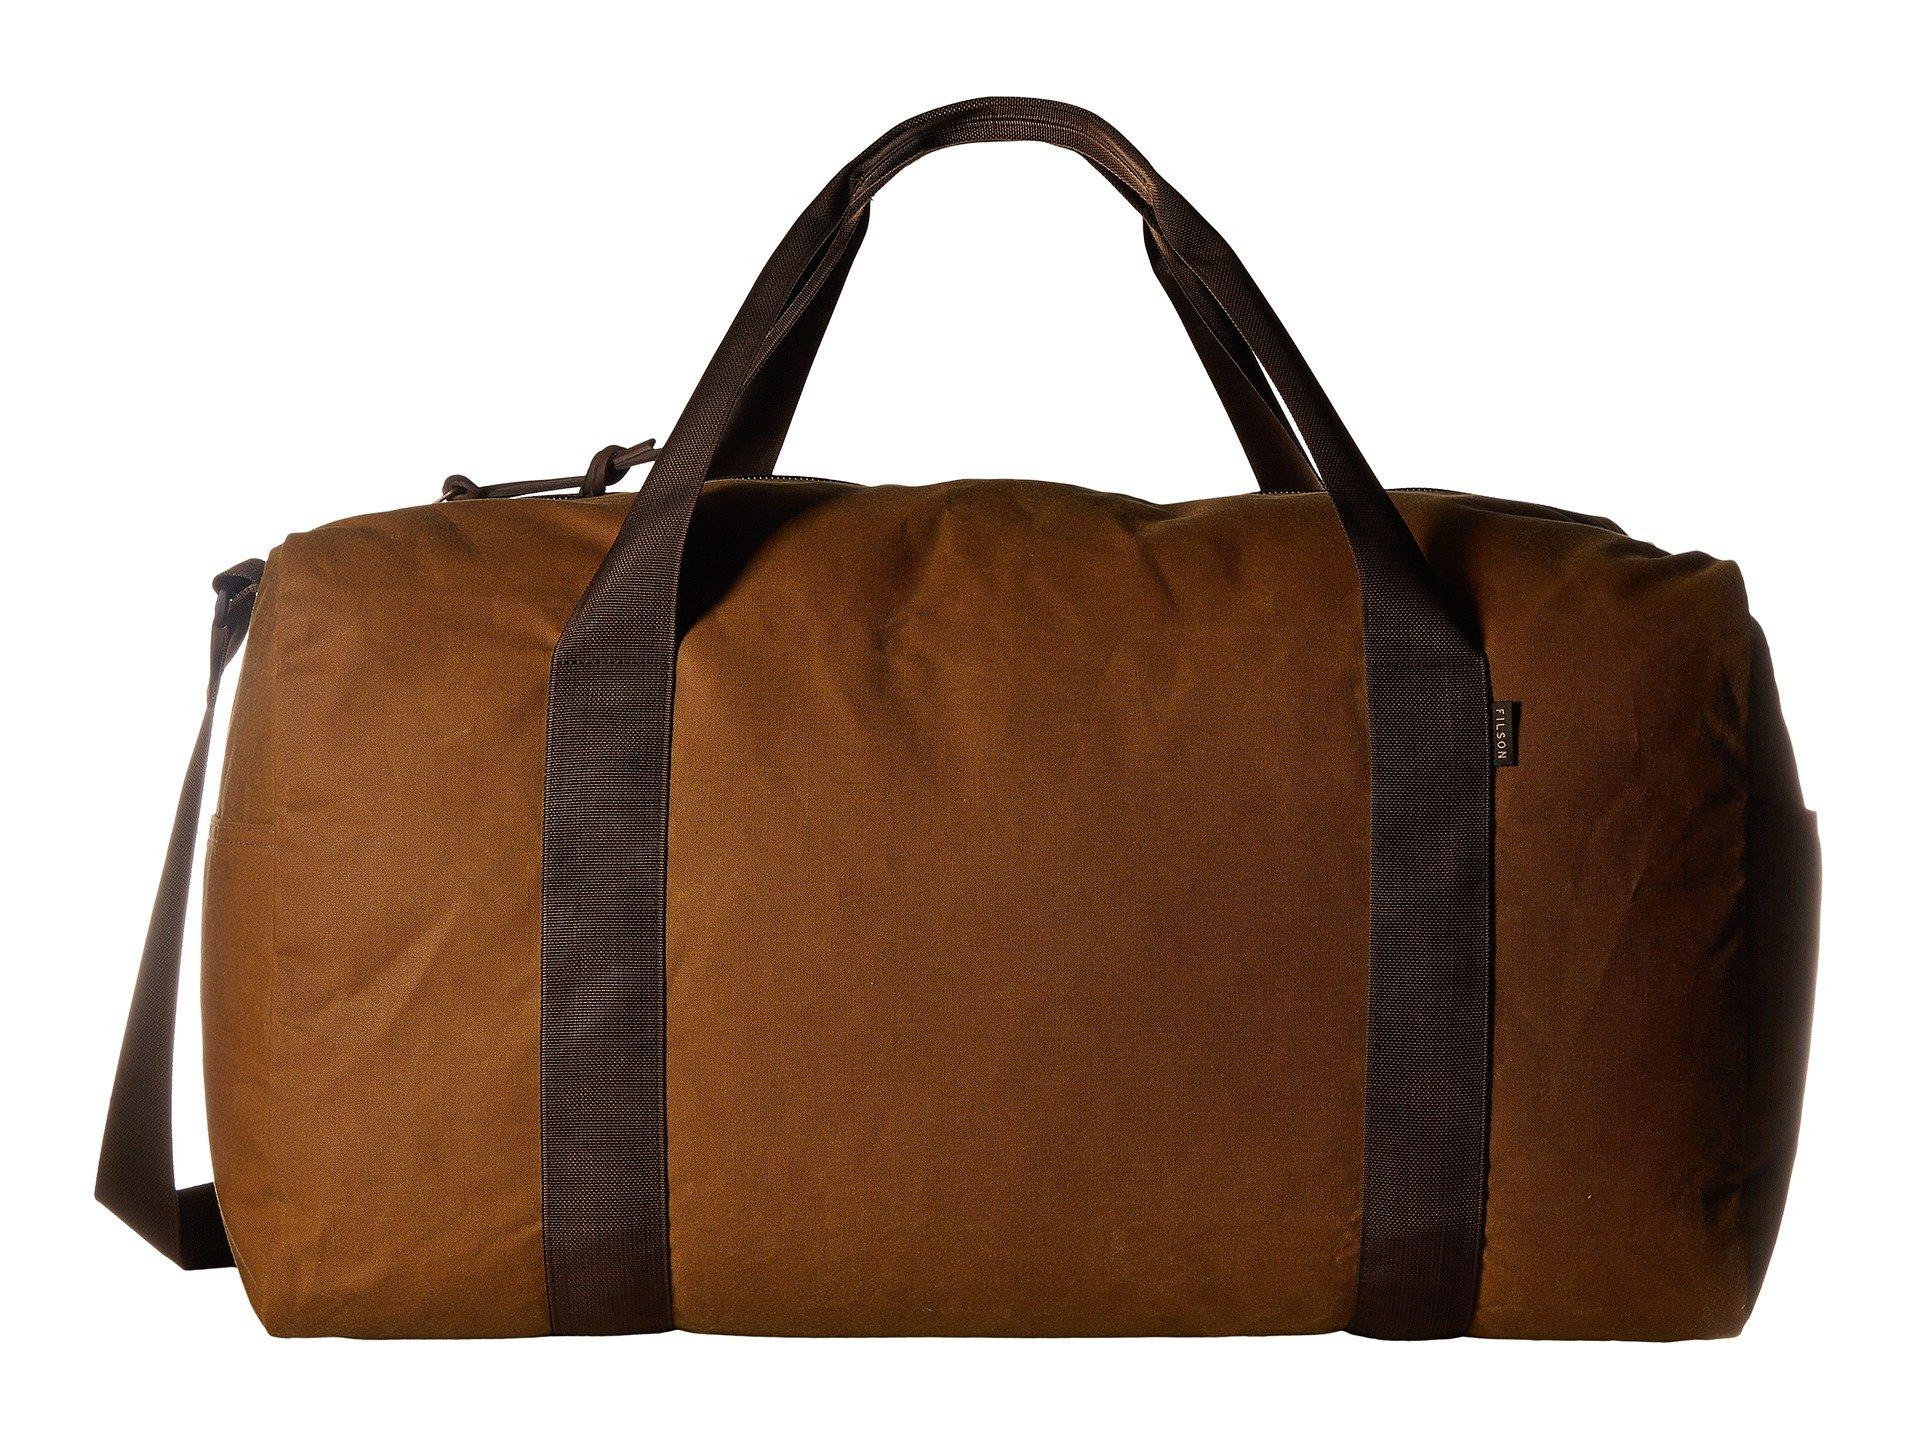 Filson Men's Medium Field Duffel, Dark Tan/Brown, One Size